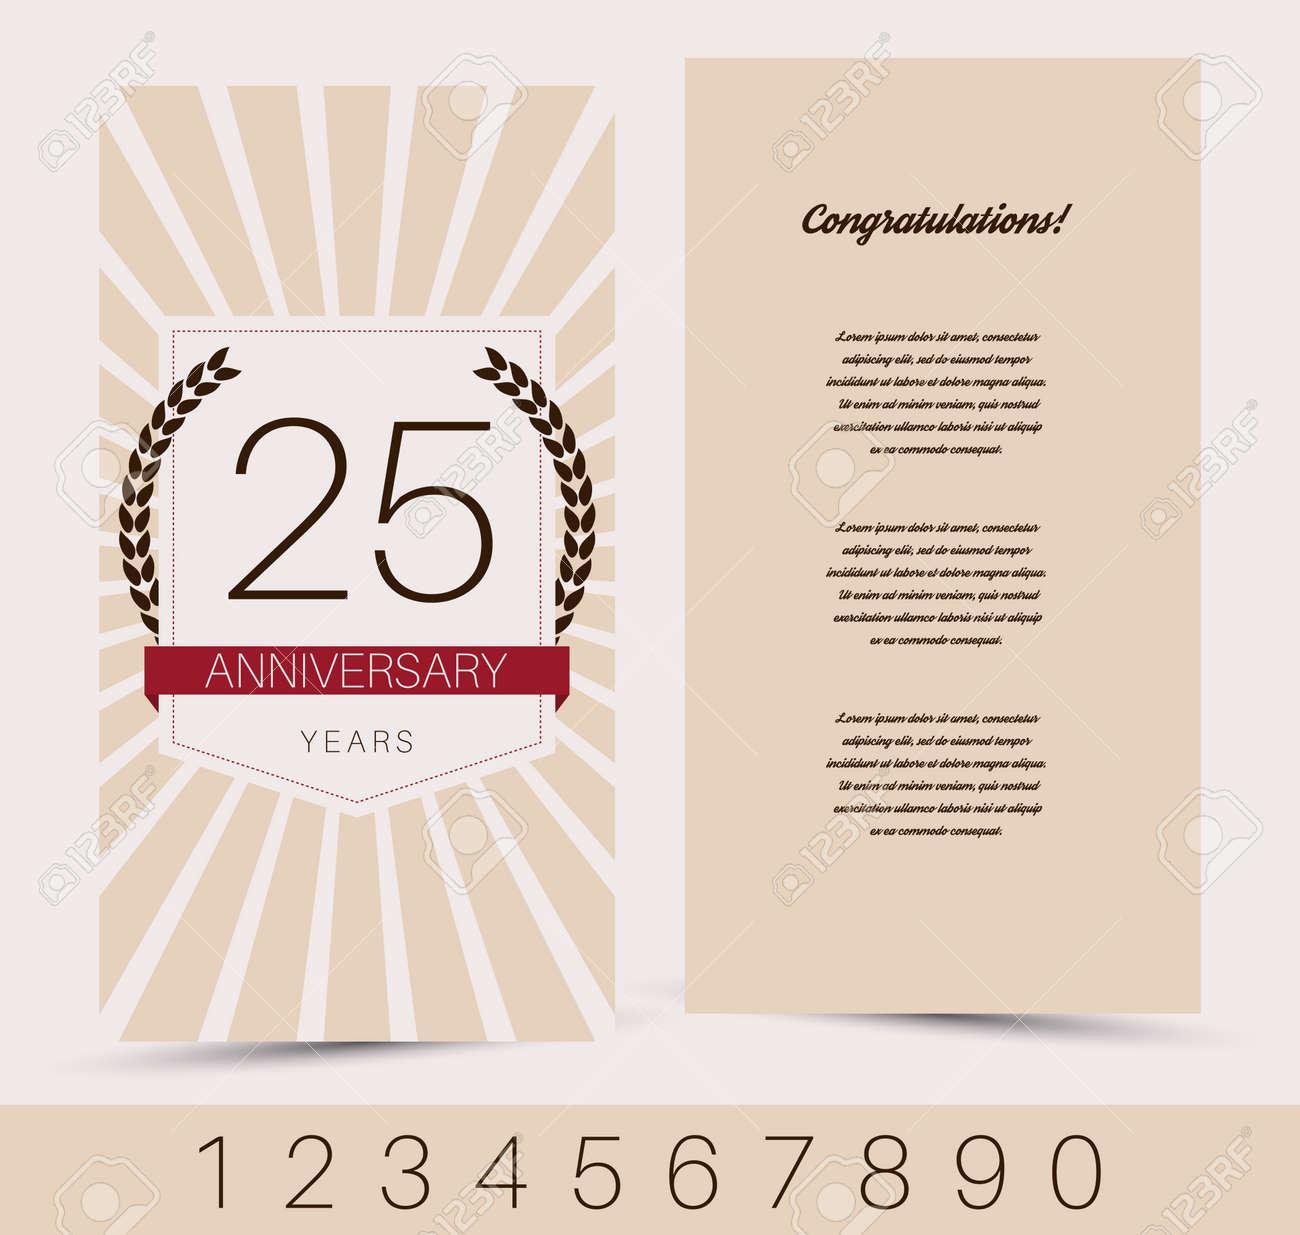 Anniversary Invitation Greeting Card Template Vector Illustration